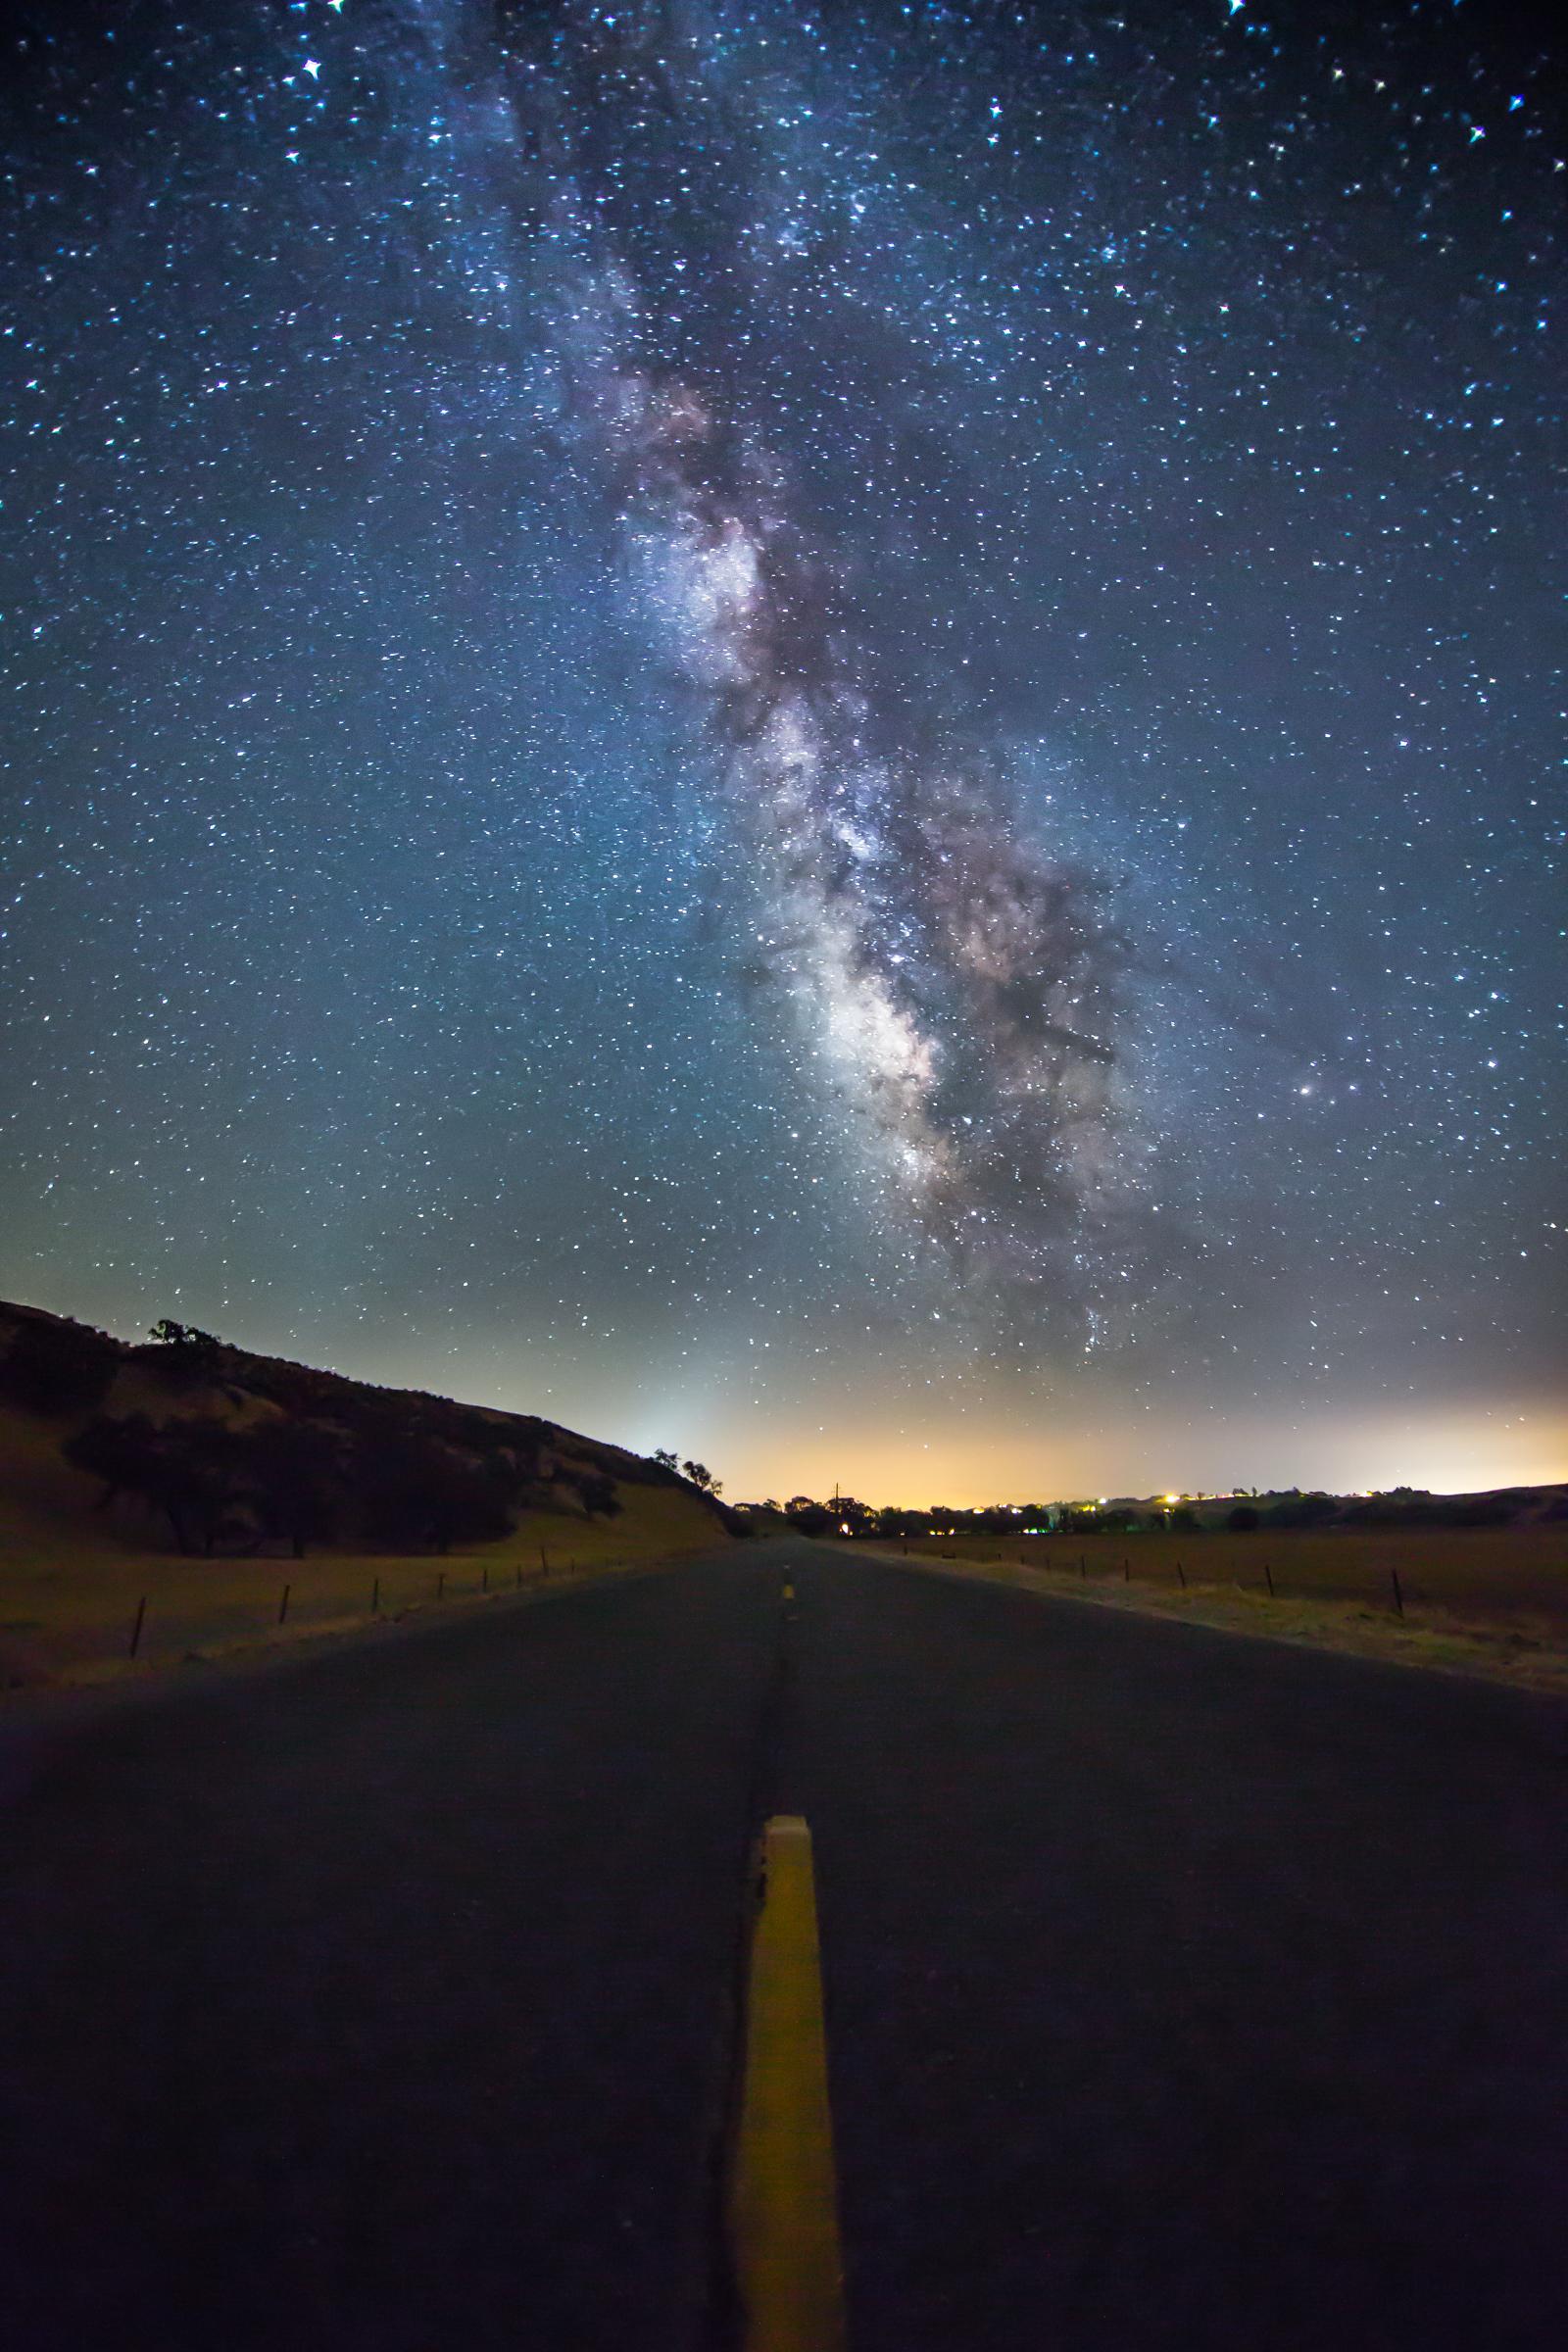 DW_AstroPhoto006.jpg